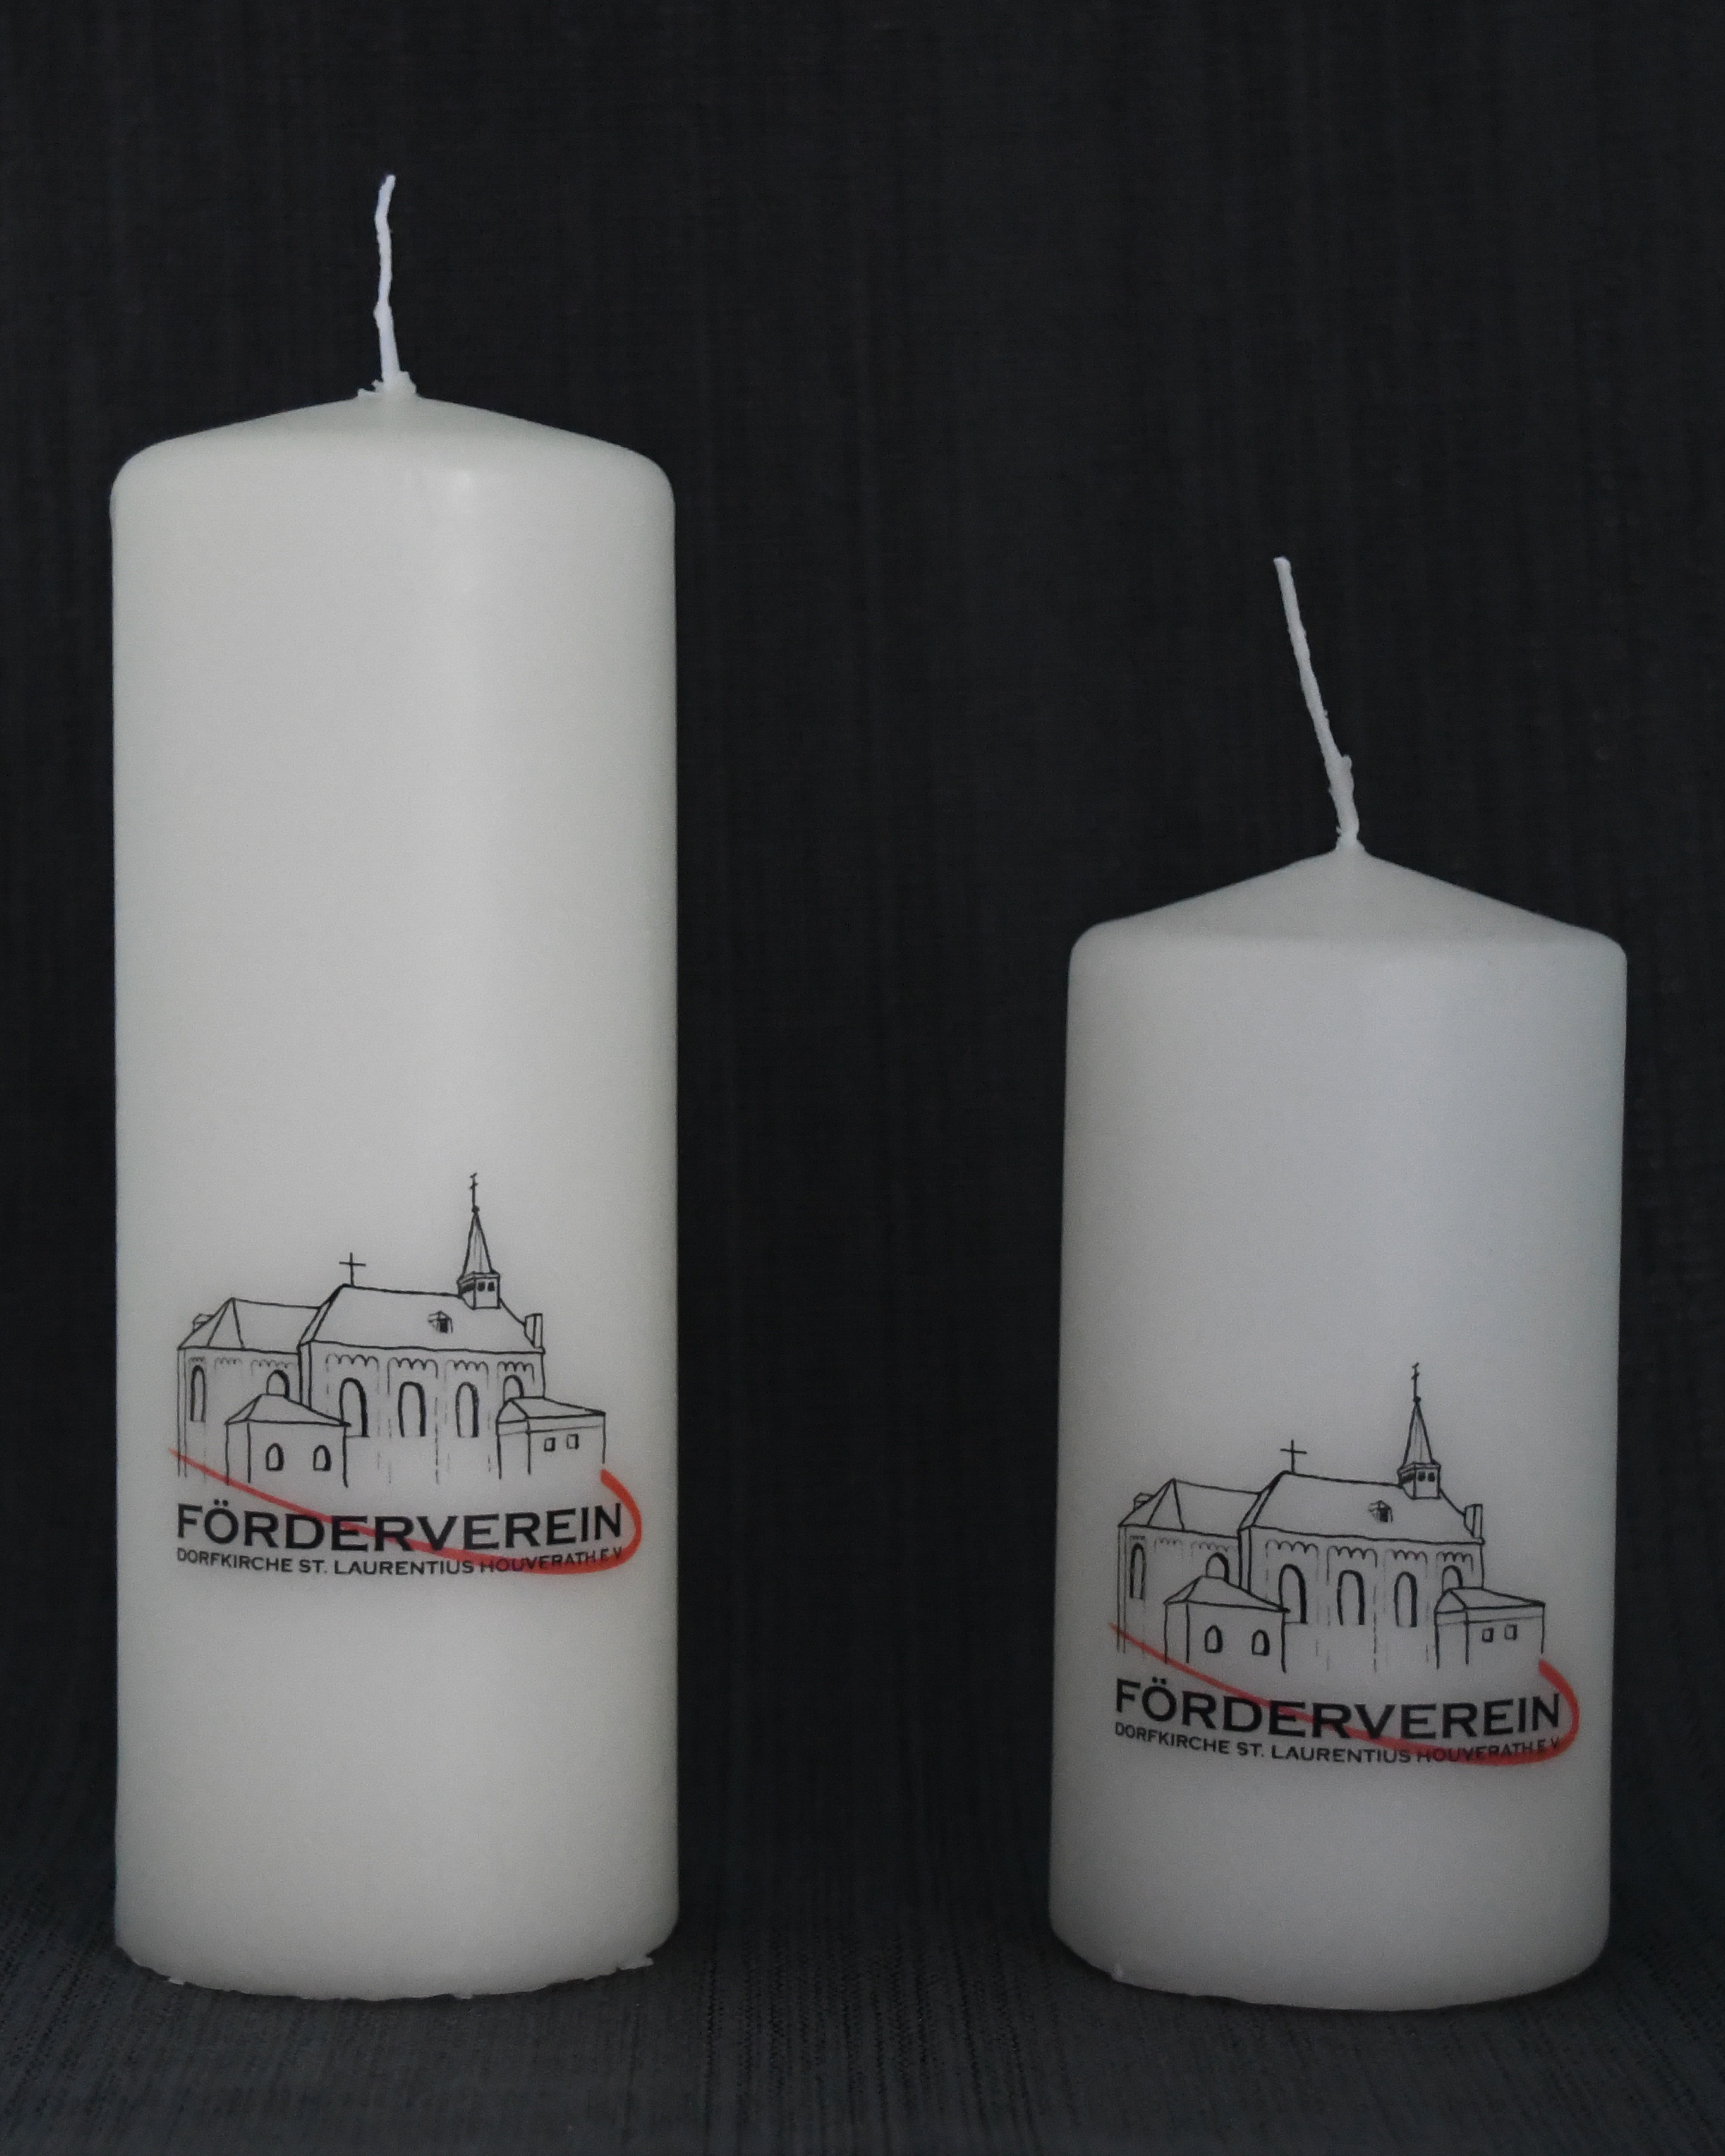 Kerzenverkauf des Fördervereins gestartet